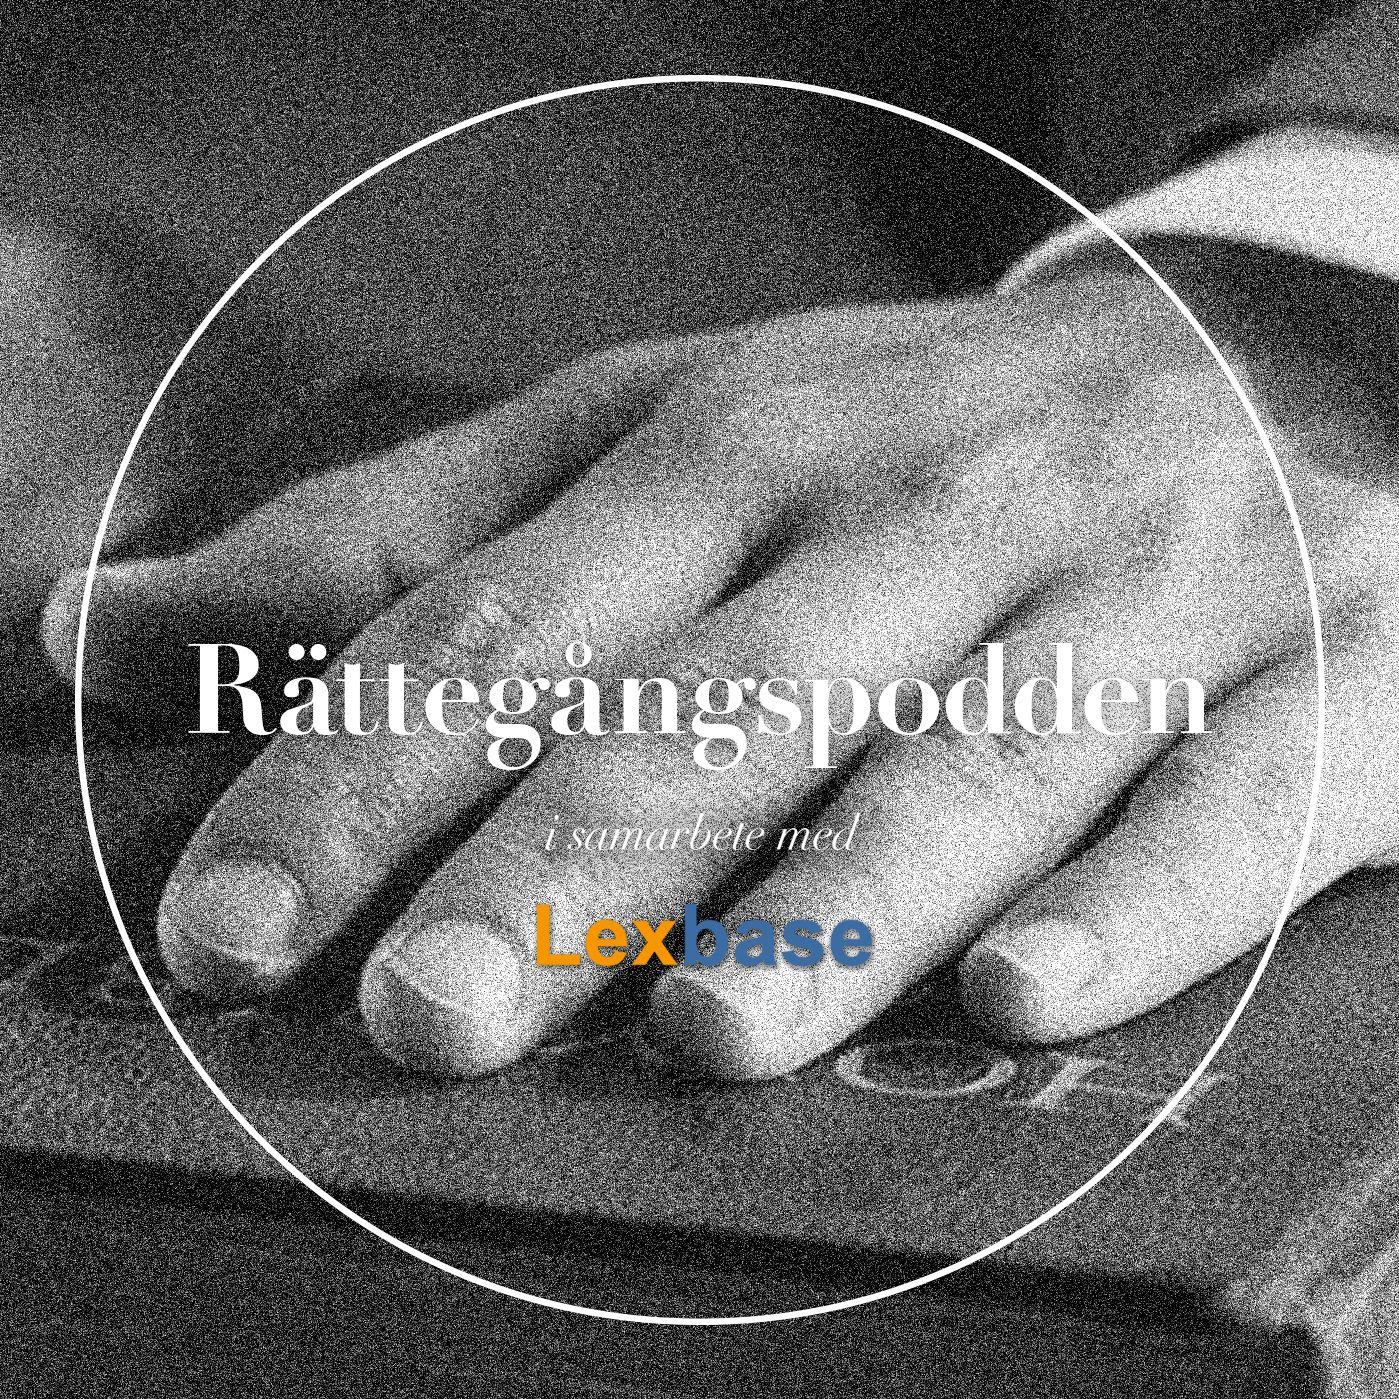 S04E07 Dödsskjutningen i Katrineholm - Del 3/3